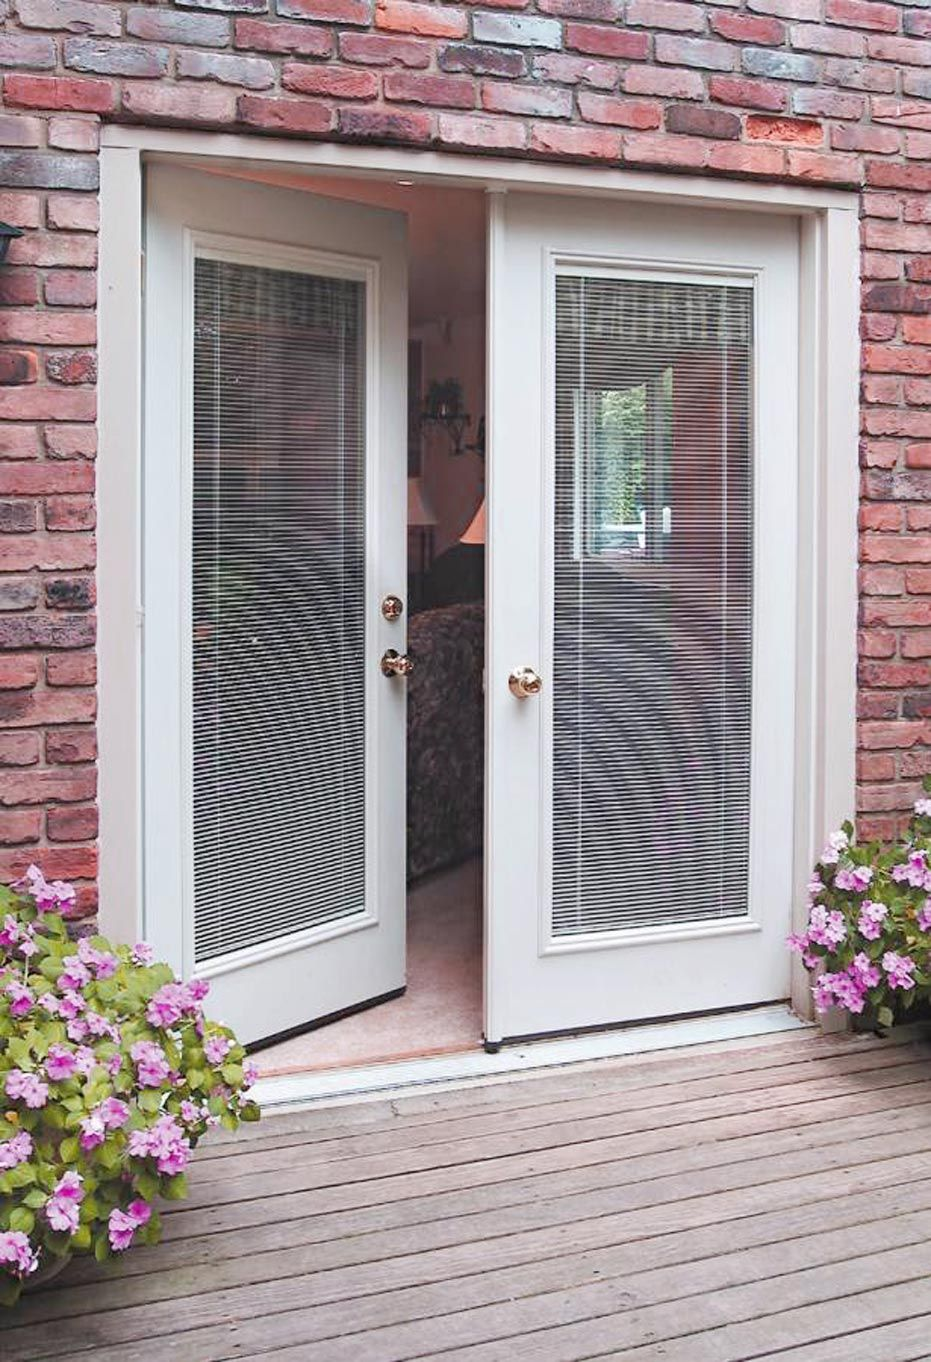 Patio Doors With Built In Blinds | Patio Doors Is A Door The Exterior Of  The House With The Inner Join ... | Stuff To Show Kerry | Pinterest | Patio  Doors, ...